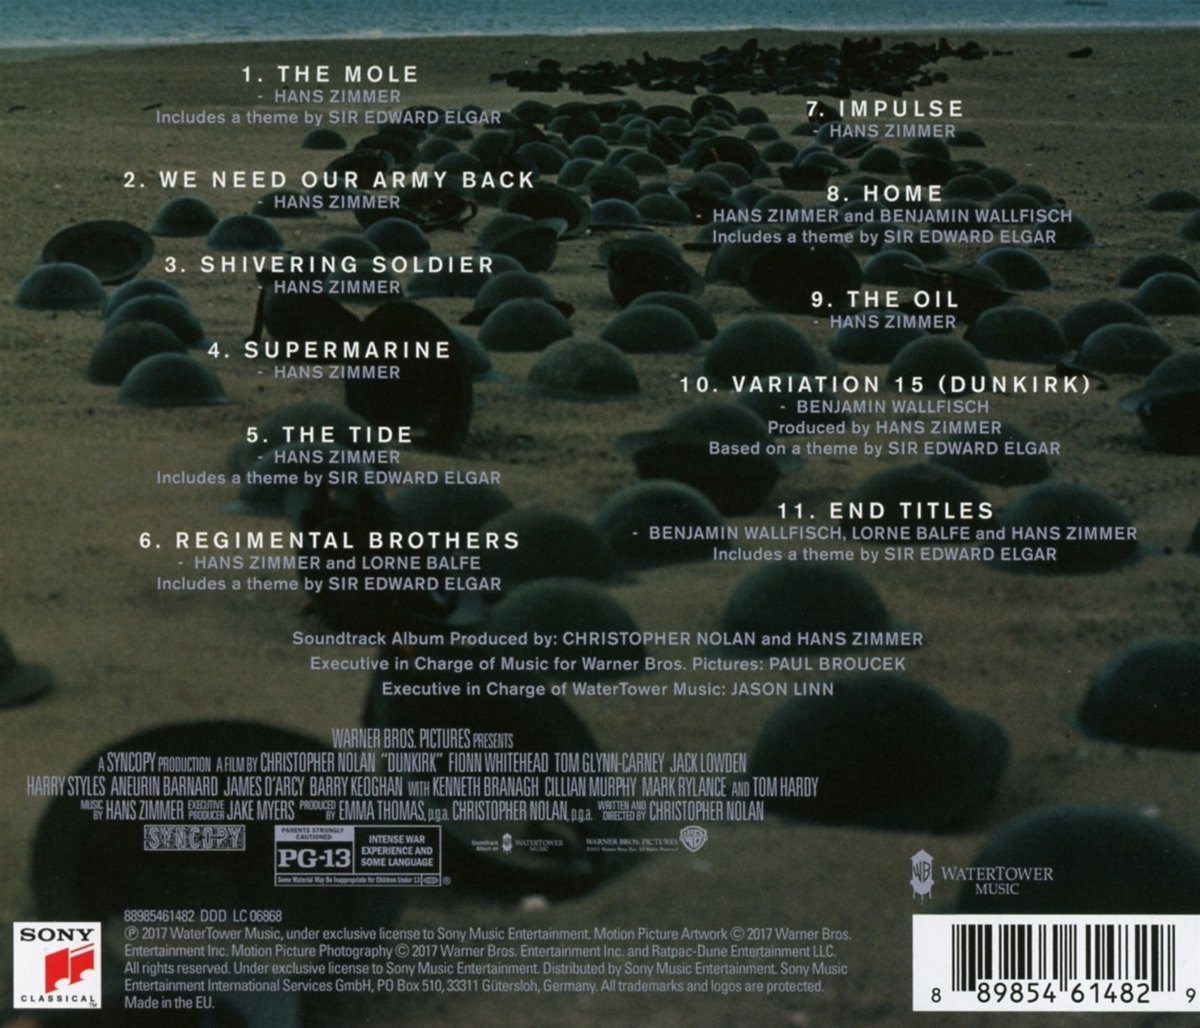 Dunkirk - Hans Zimmer, various: Amazon.de: Musik